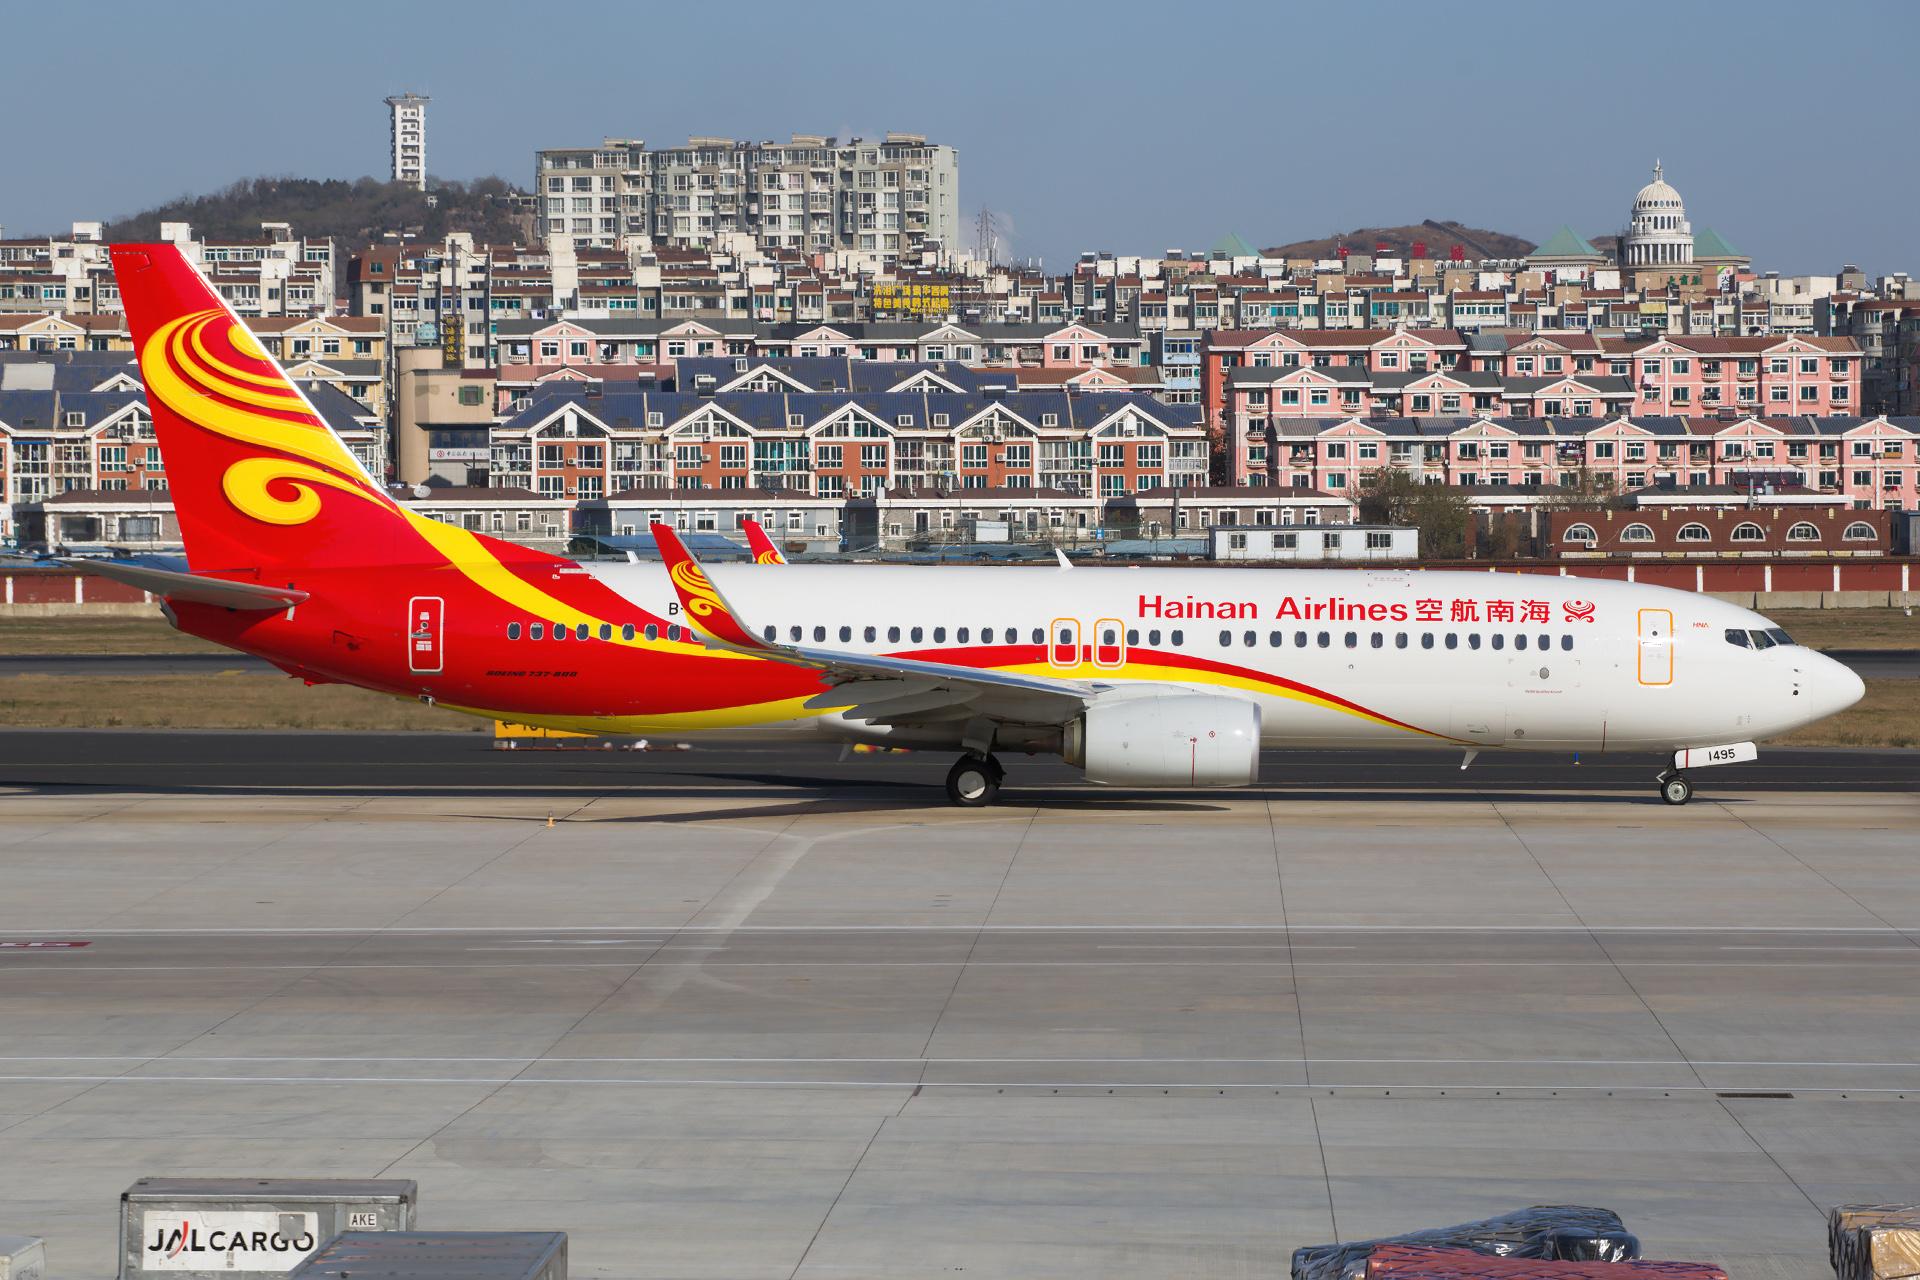 Re:[原创][DLC]。。。 杂图。。。 BOEING 737-800 B-1495 中国大连国际机场